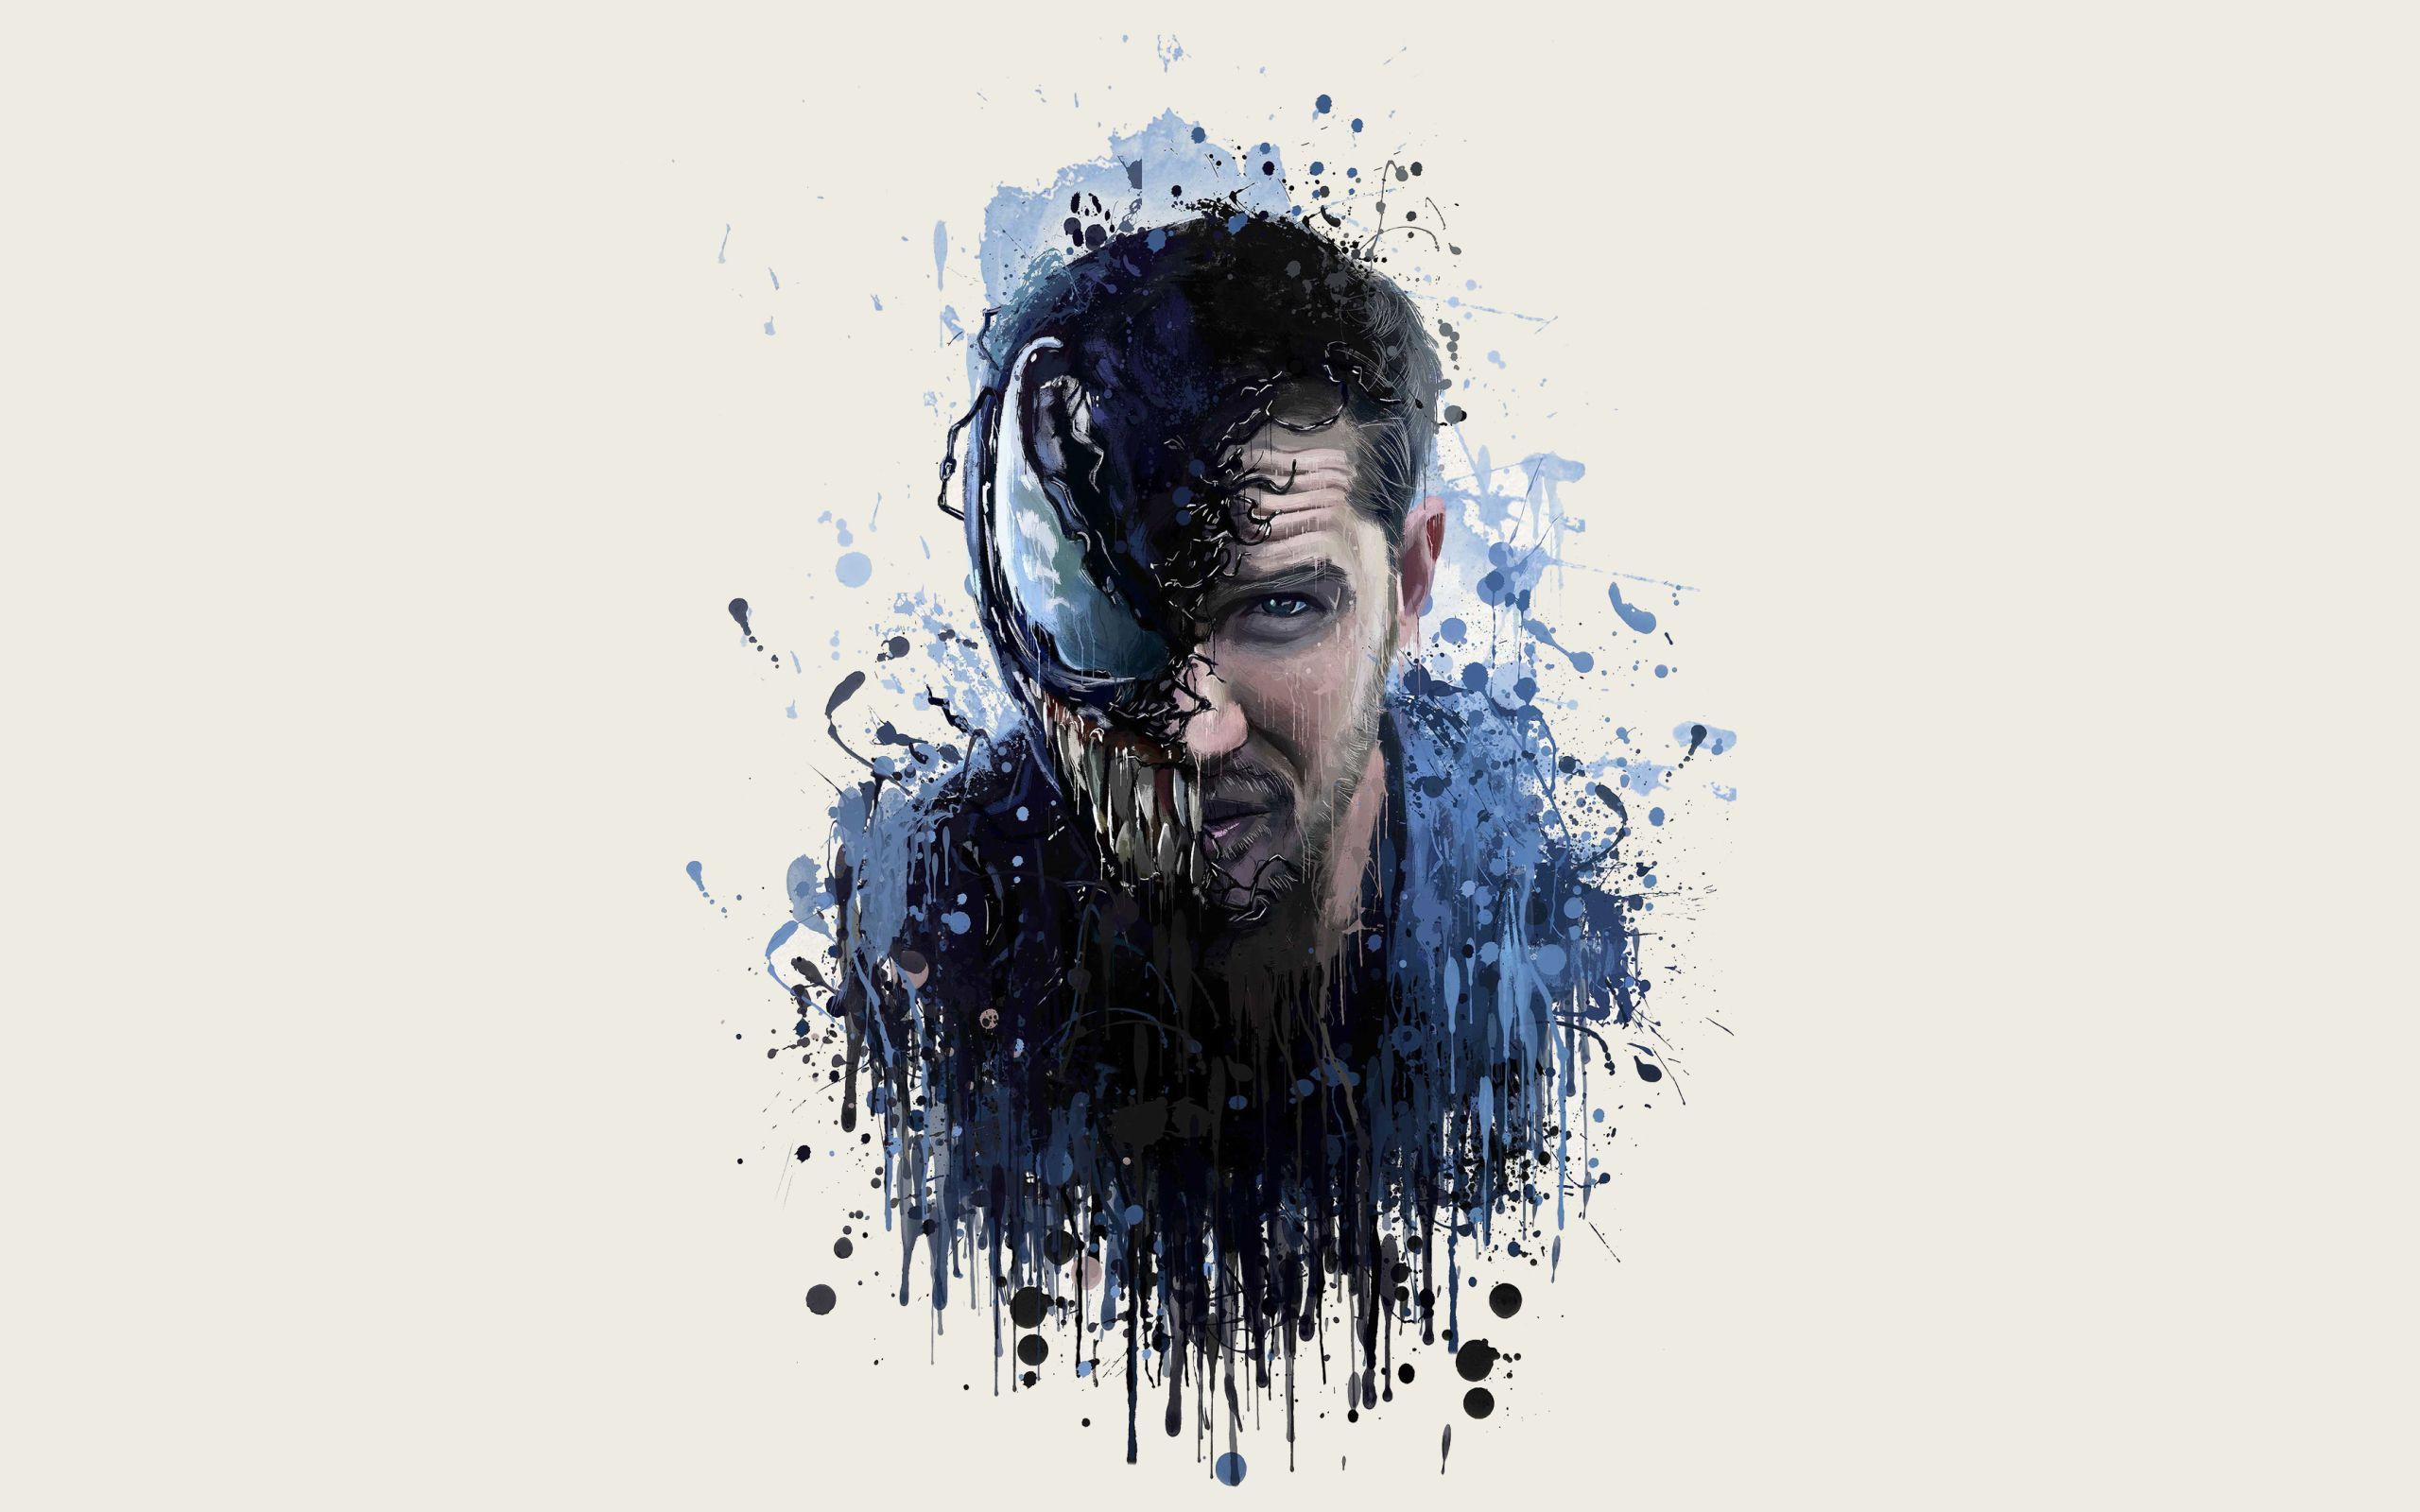 Venom Wallpaper 20 2560 x 1600